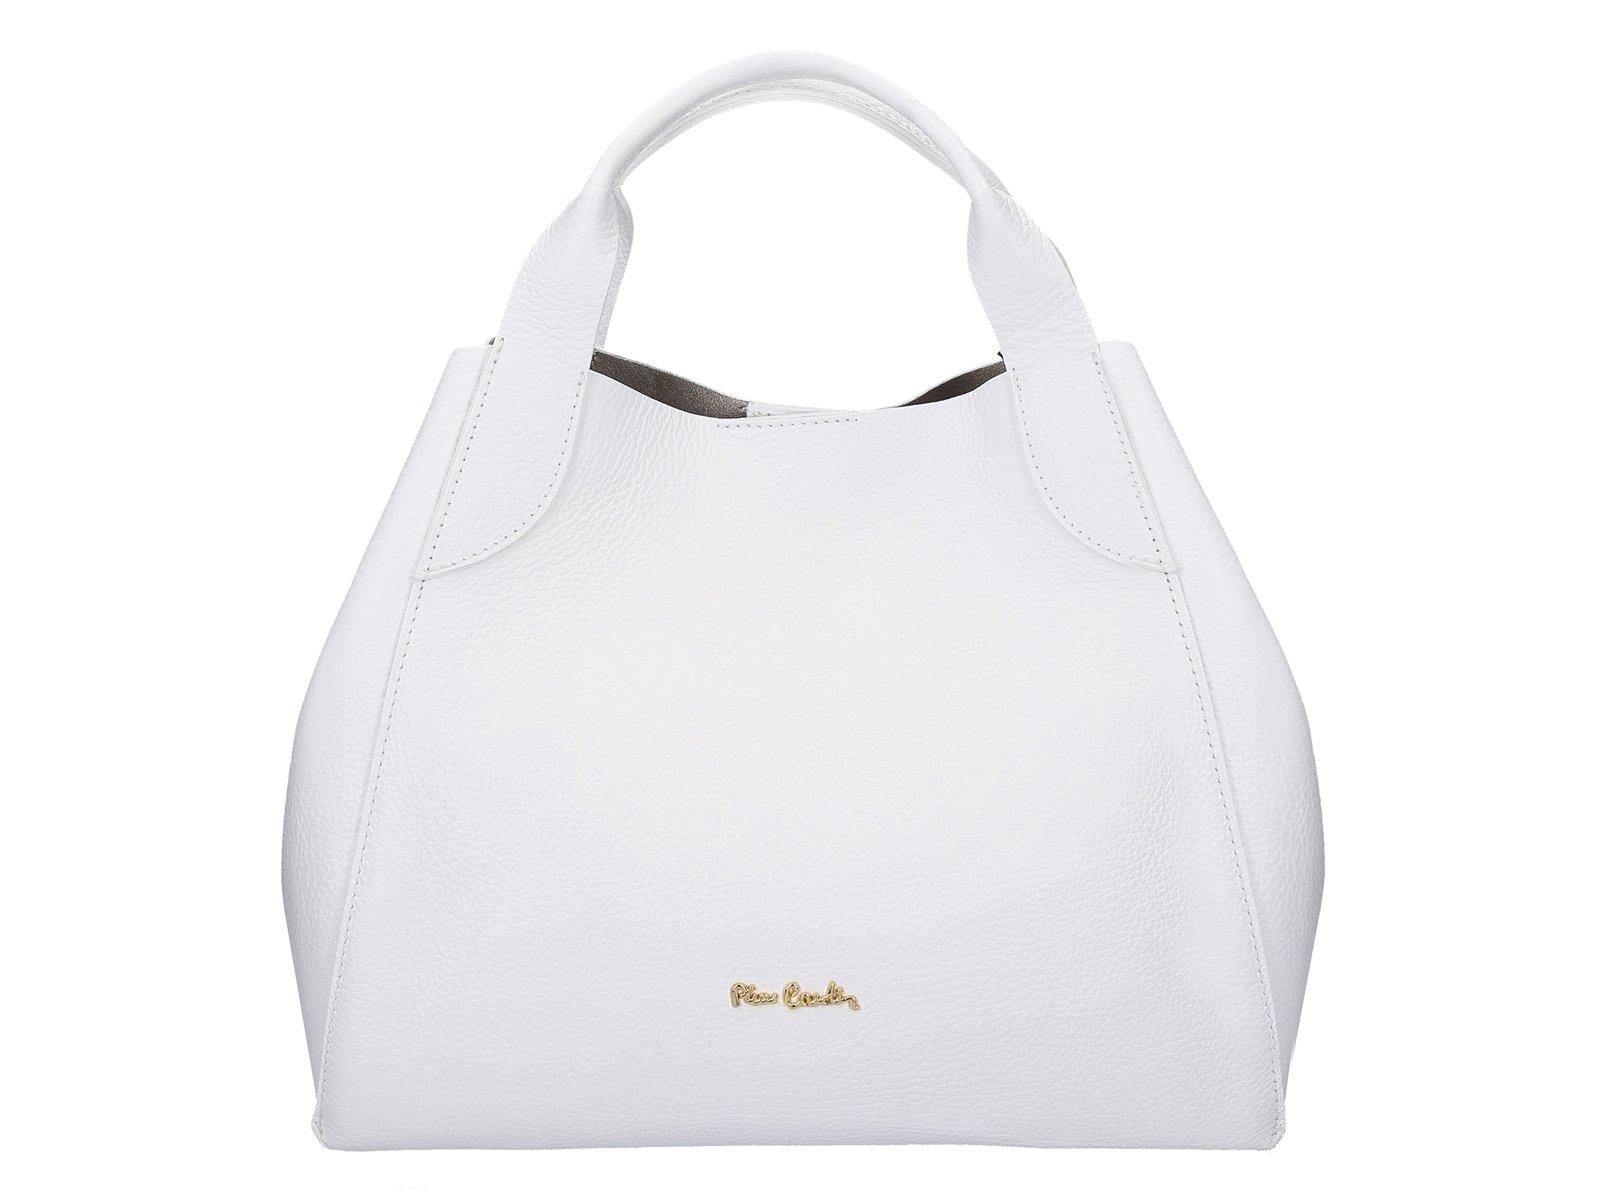 Dámská kabelka Pierre Cardin FRZ1619 DOLLARO - bílá  98c53016b62